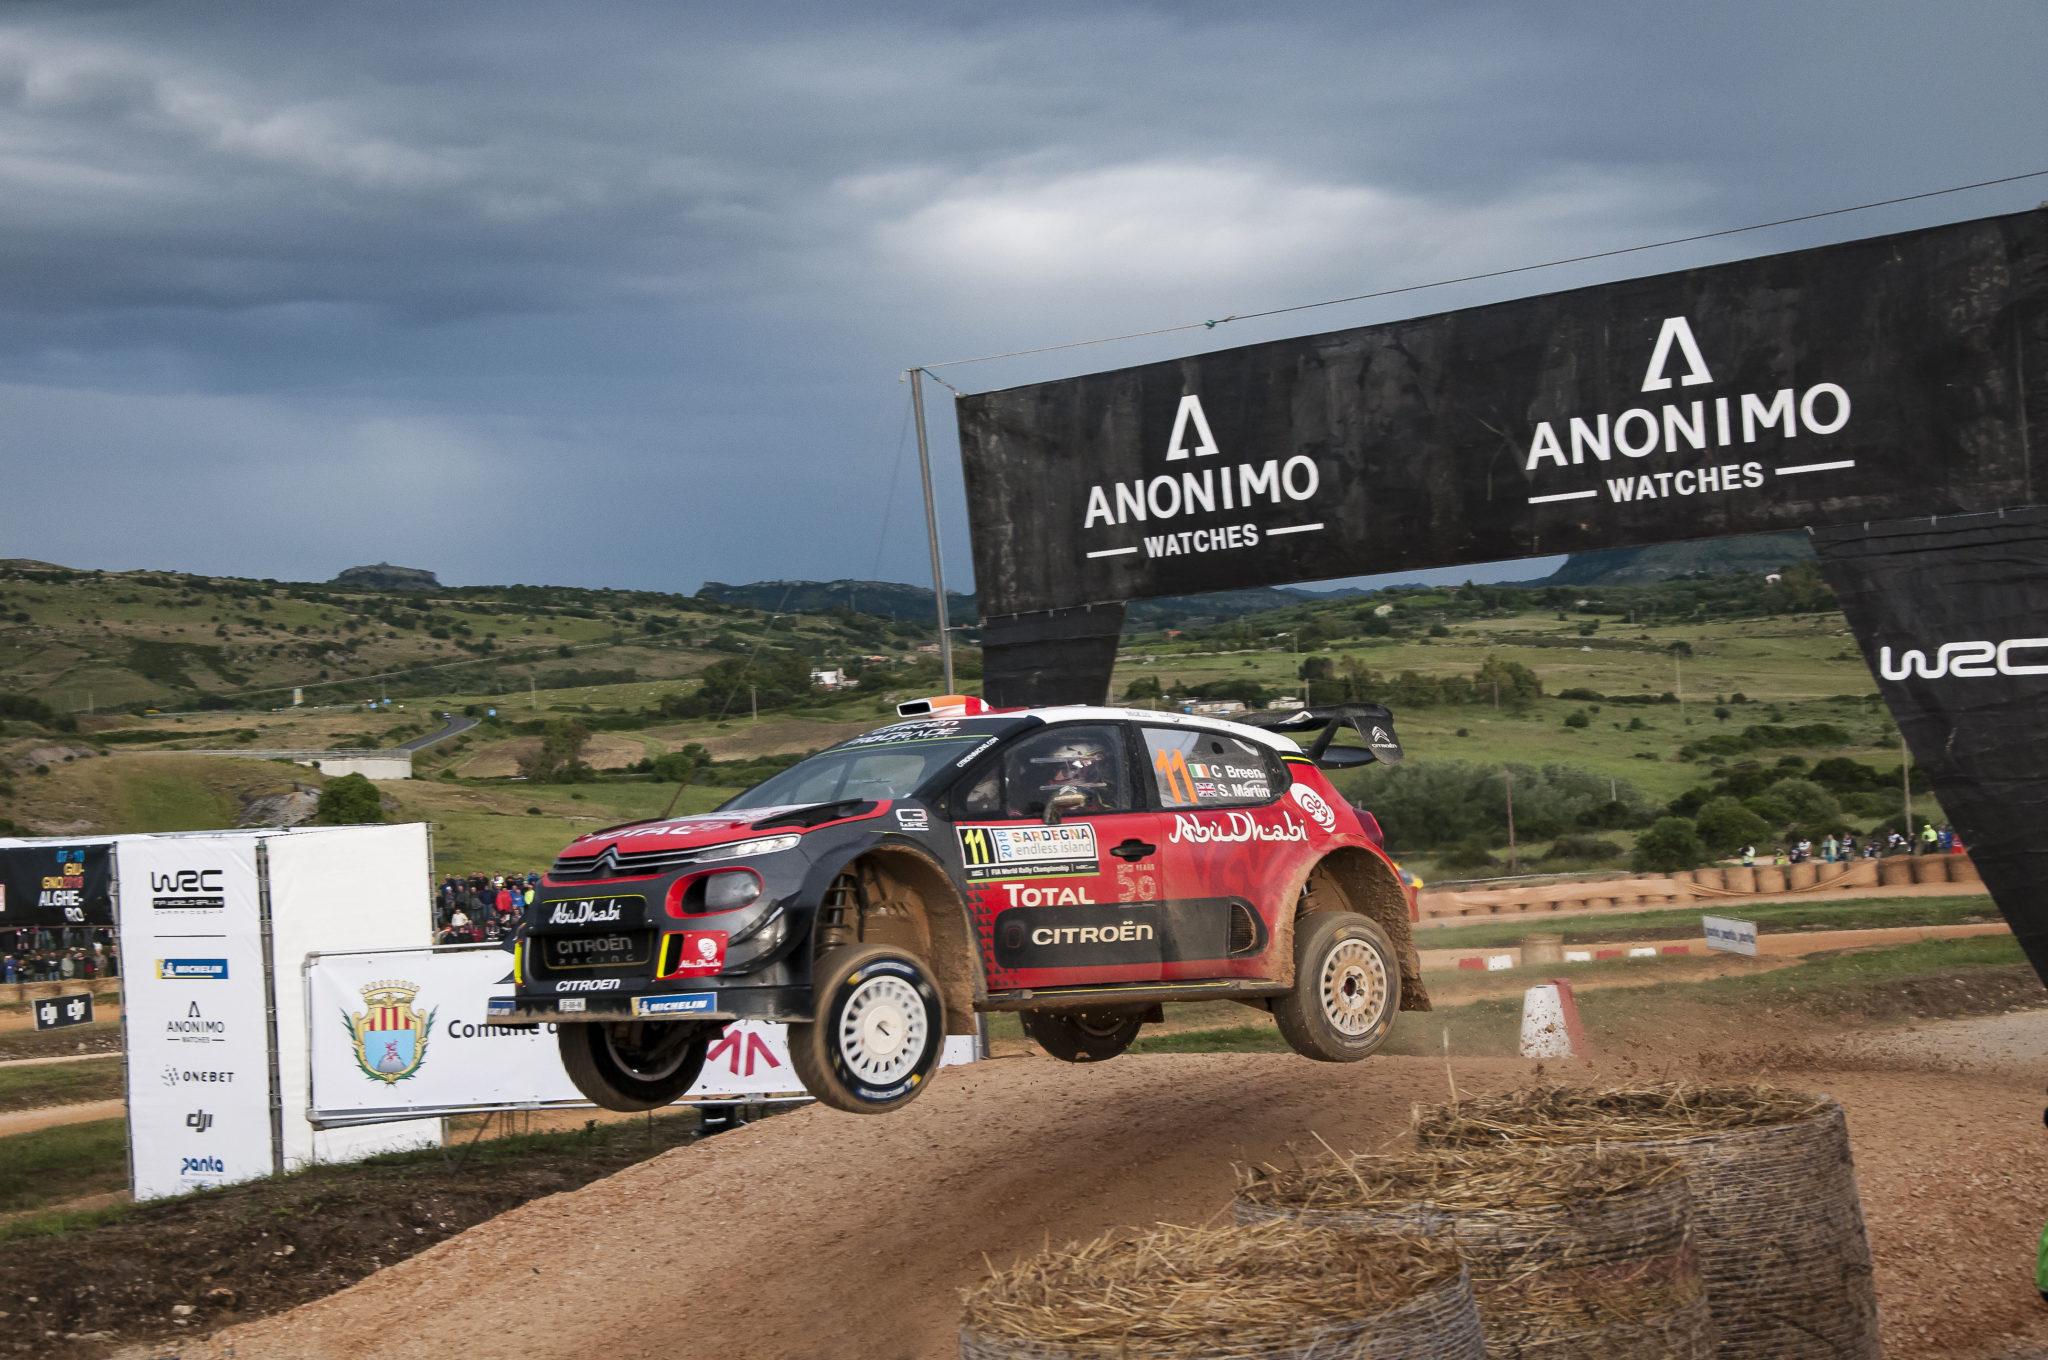 ANONIMO and WRC at Ittiri Arena Show Sardinia